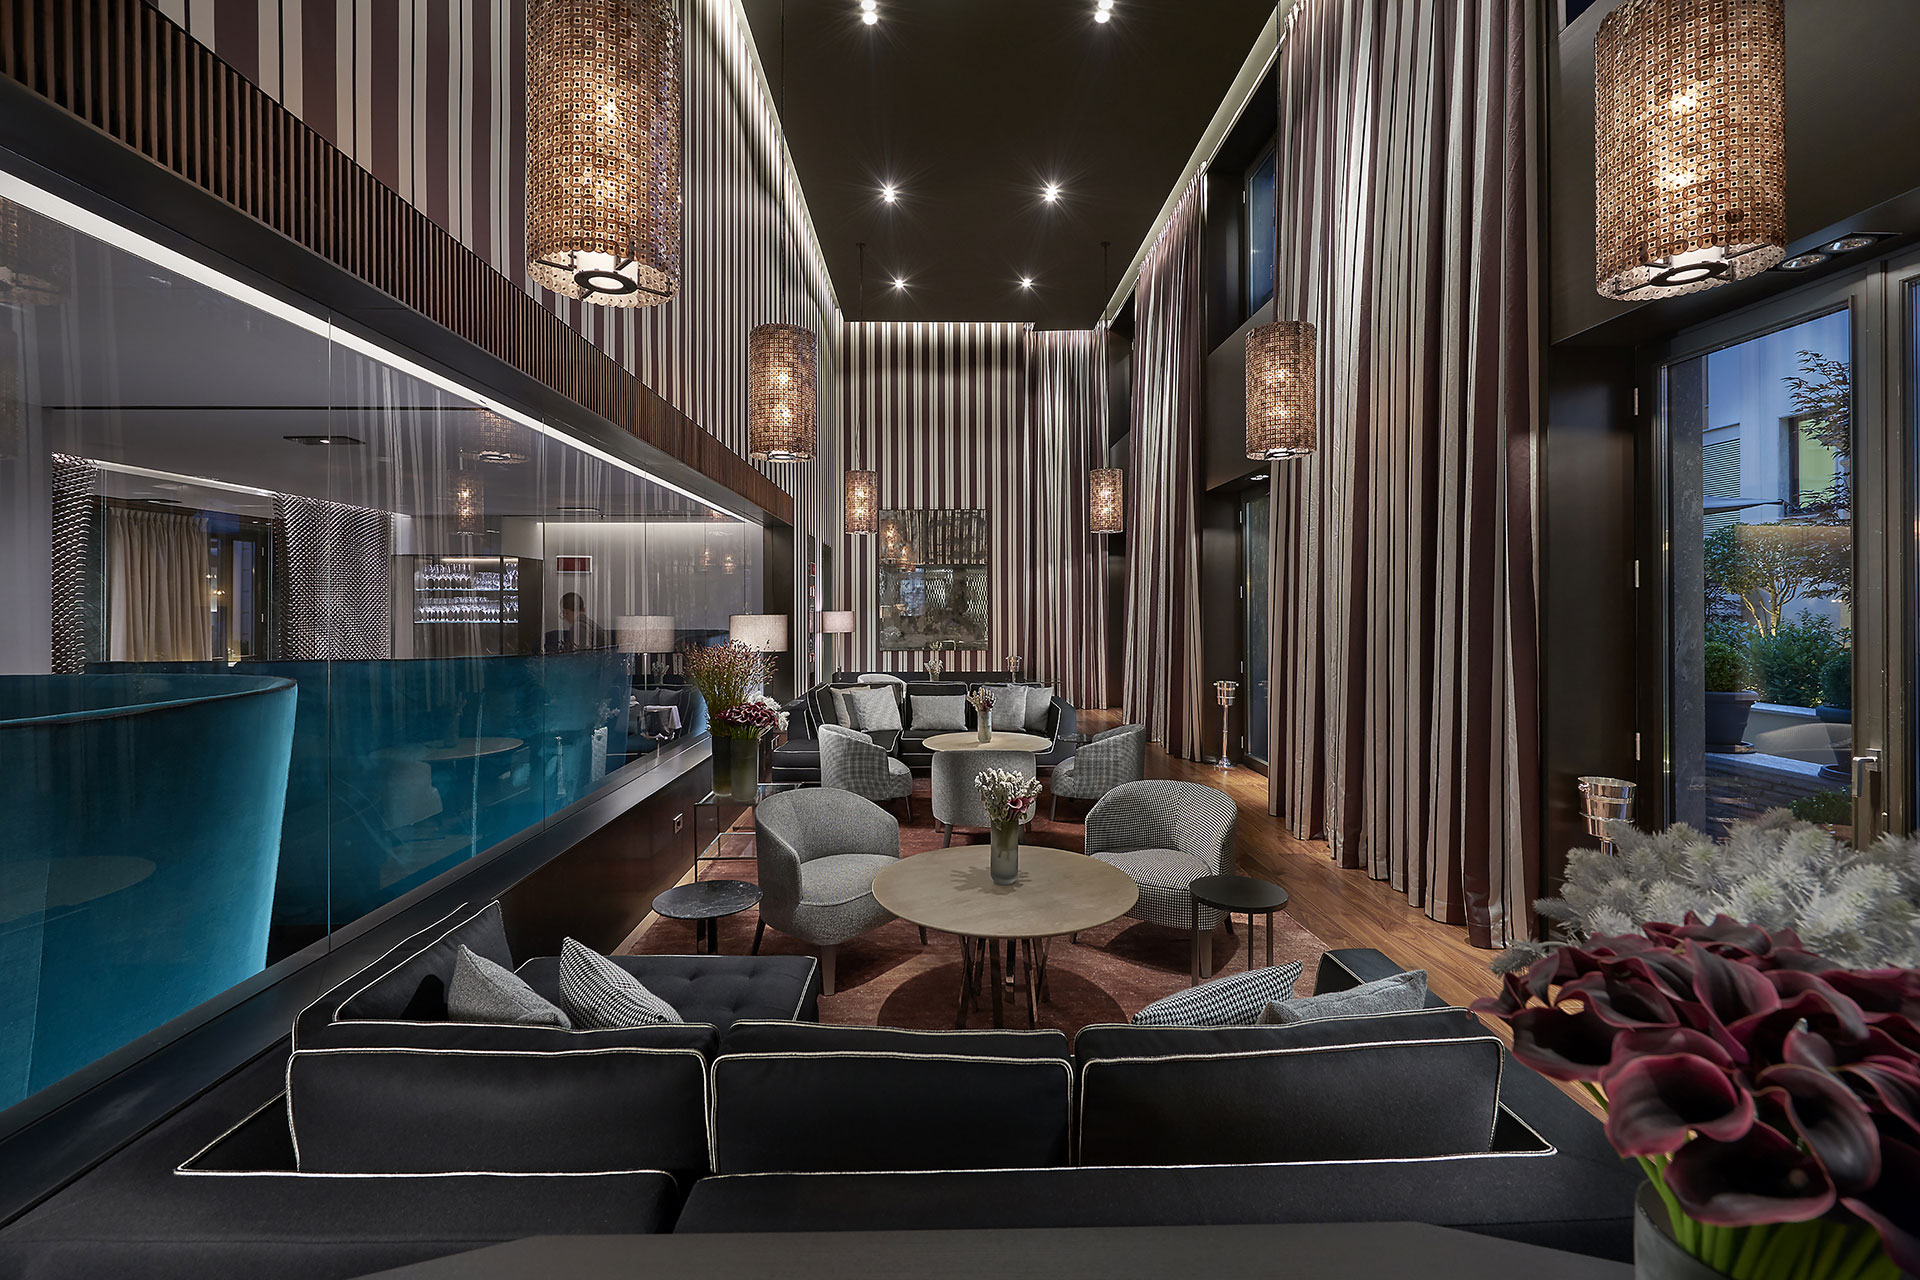 HOTEL MANDARIN ORIENTAL 2